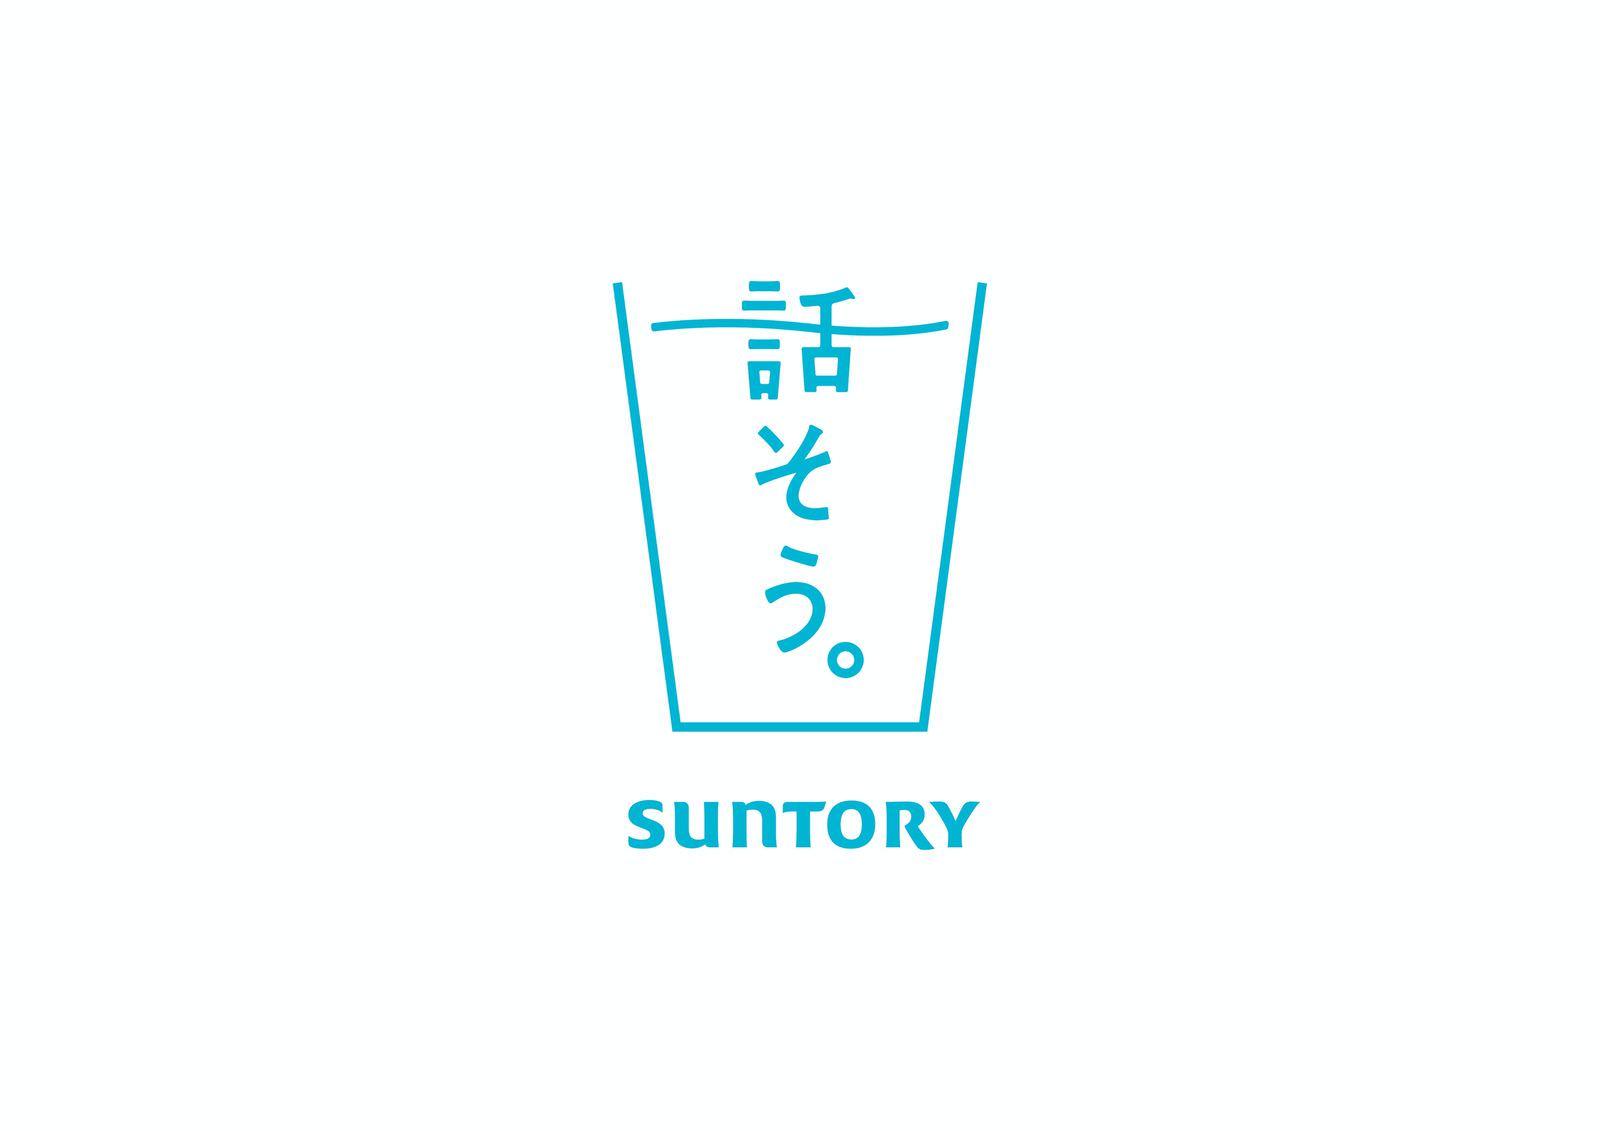 https://dentsulab.tokyo/works/wp-content/uploads/sites/3/2020/09/suntory_hanasou_1.jpeg